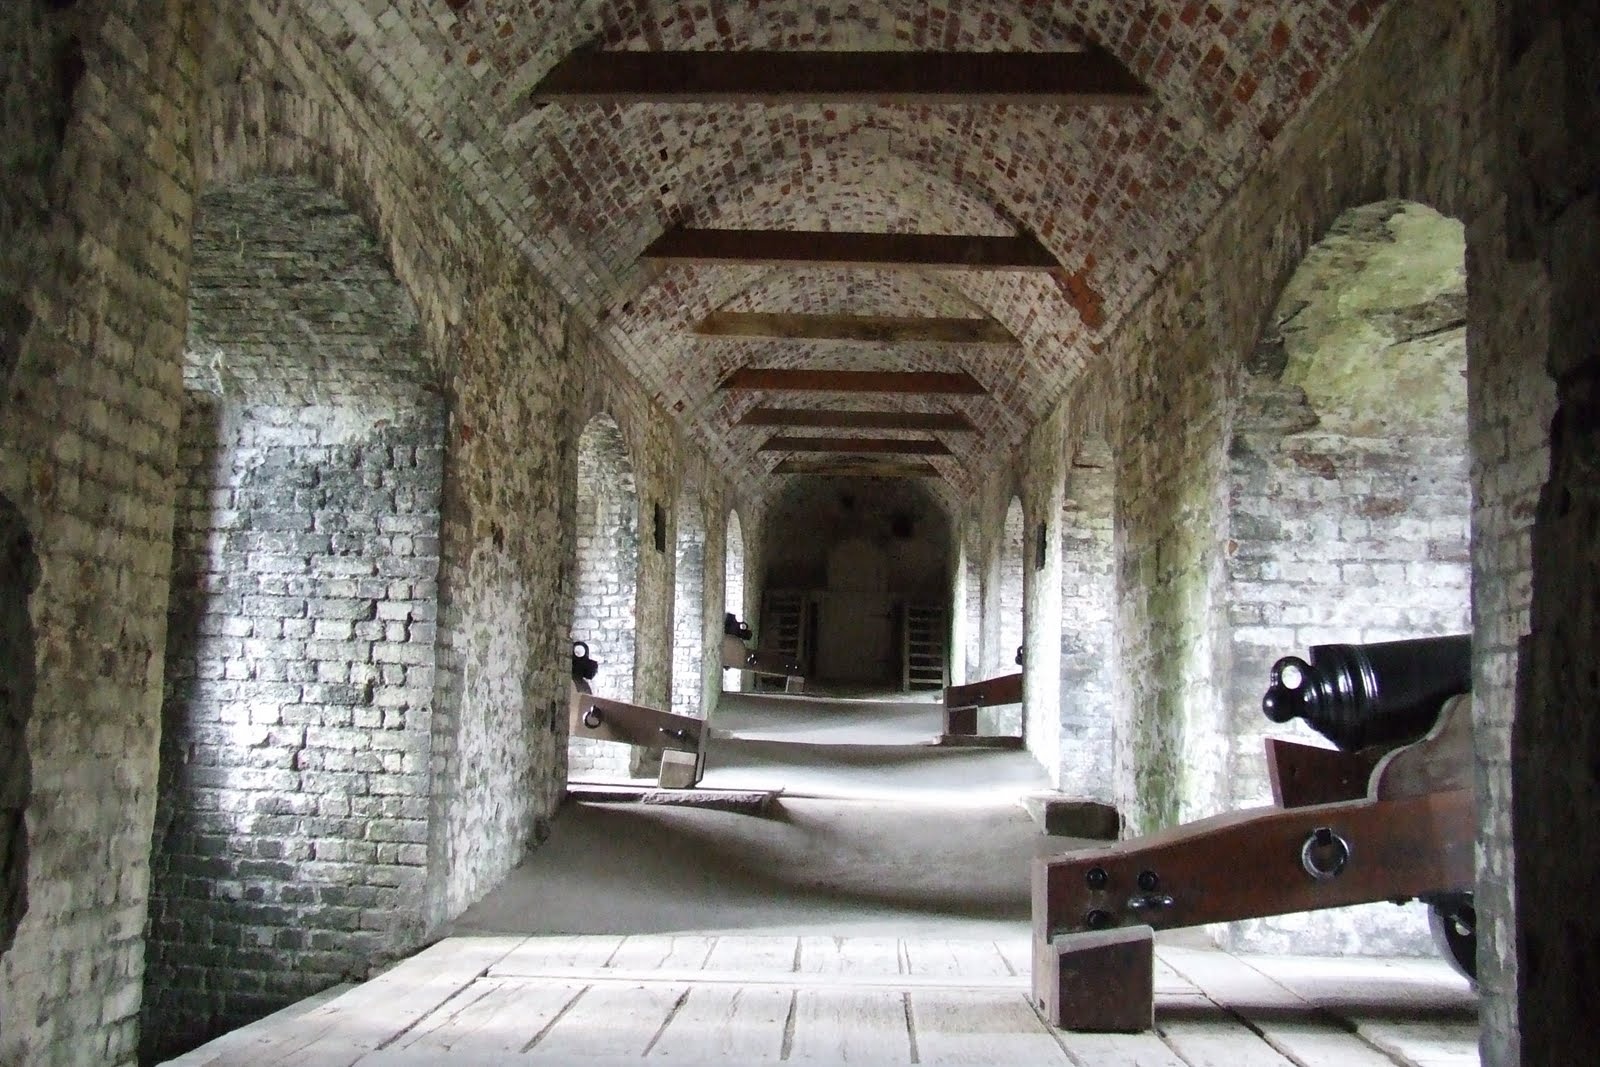 Subterranean History: Dover Castle Tunnels